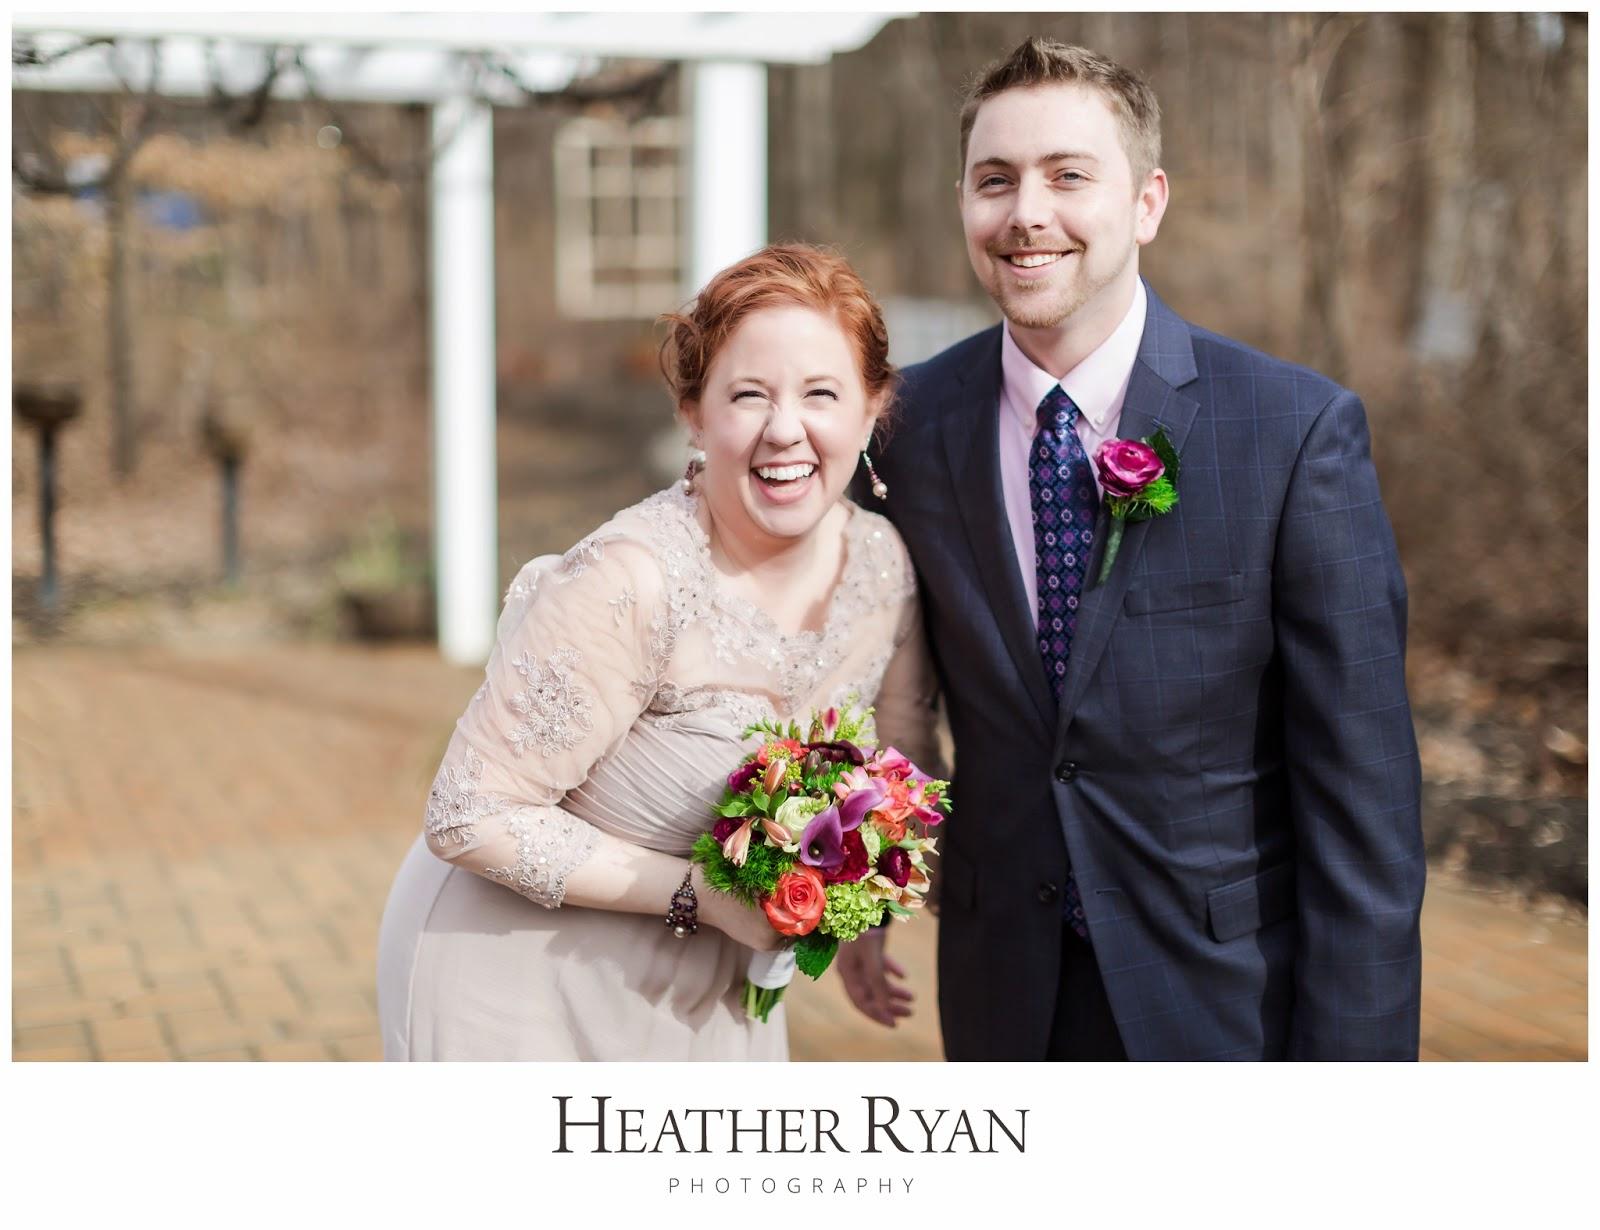 Annapolis Wedding Photographer, Heather Ryan Photography